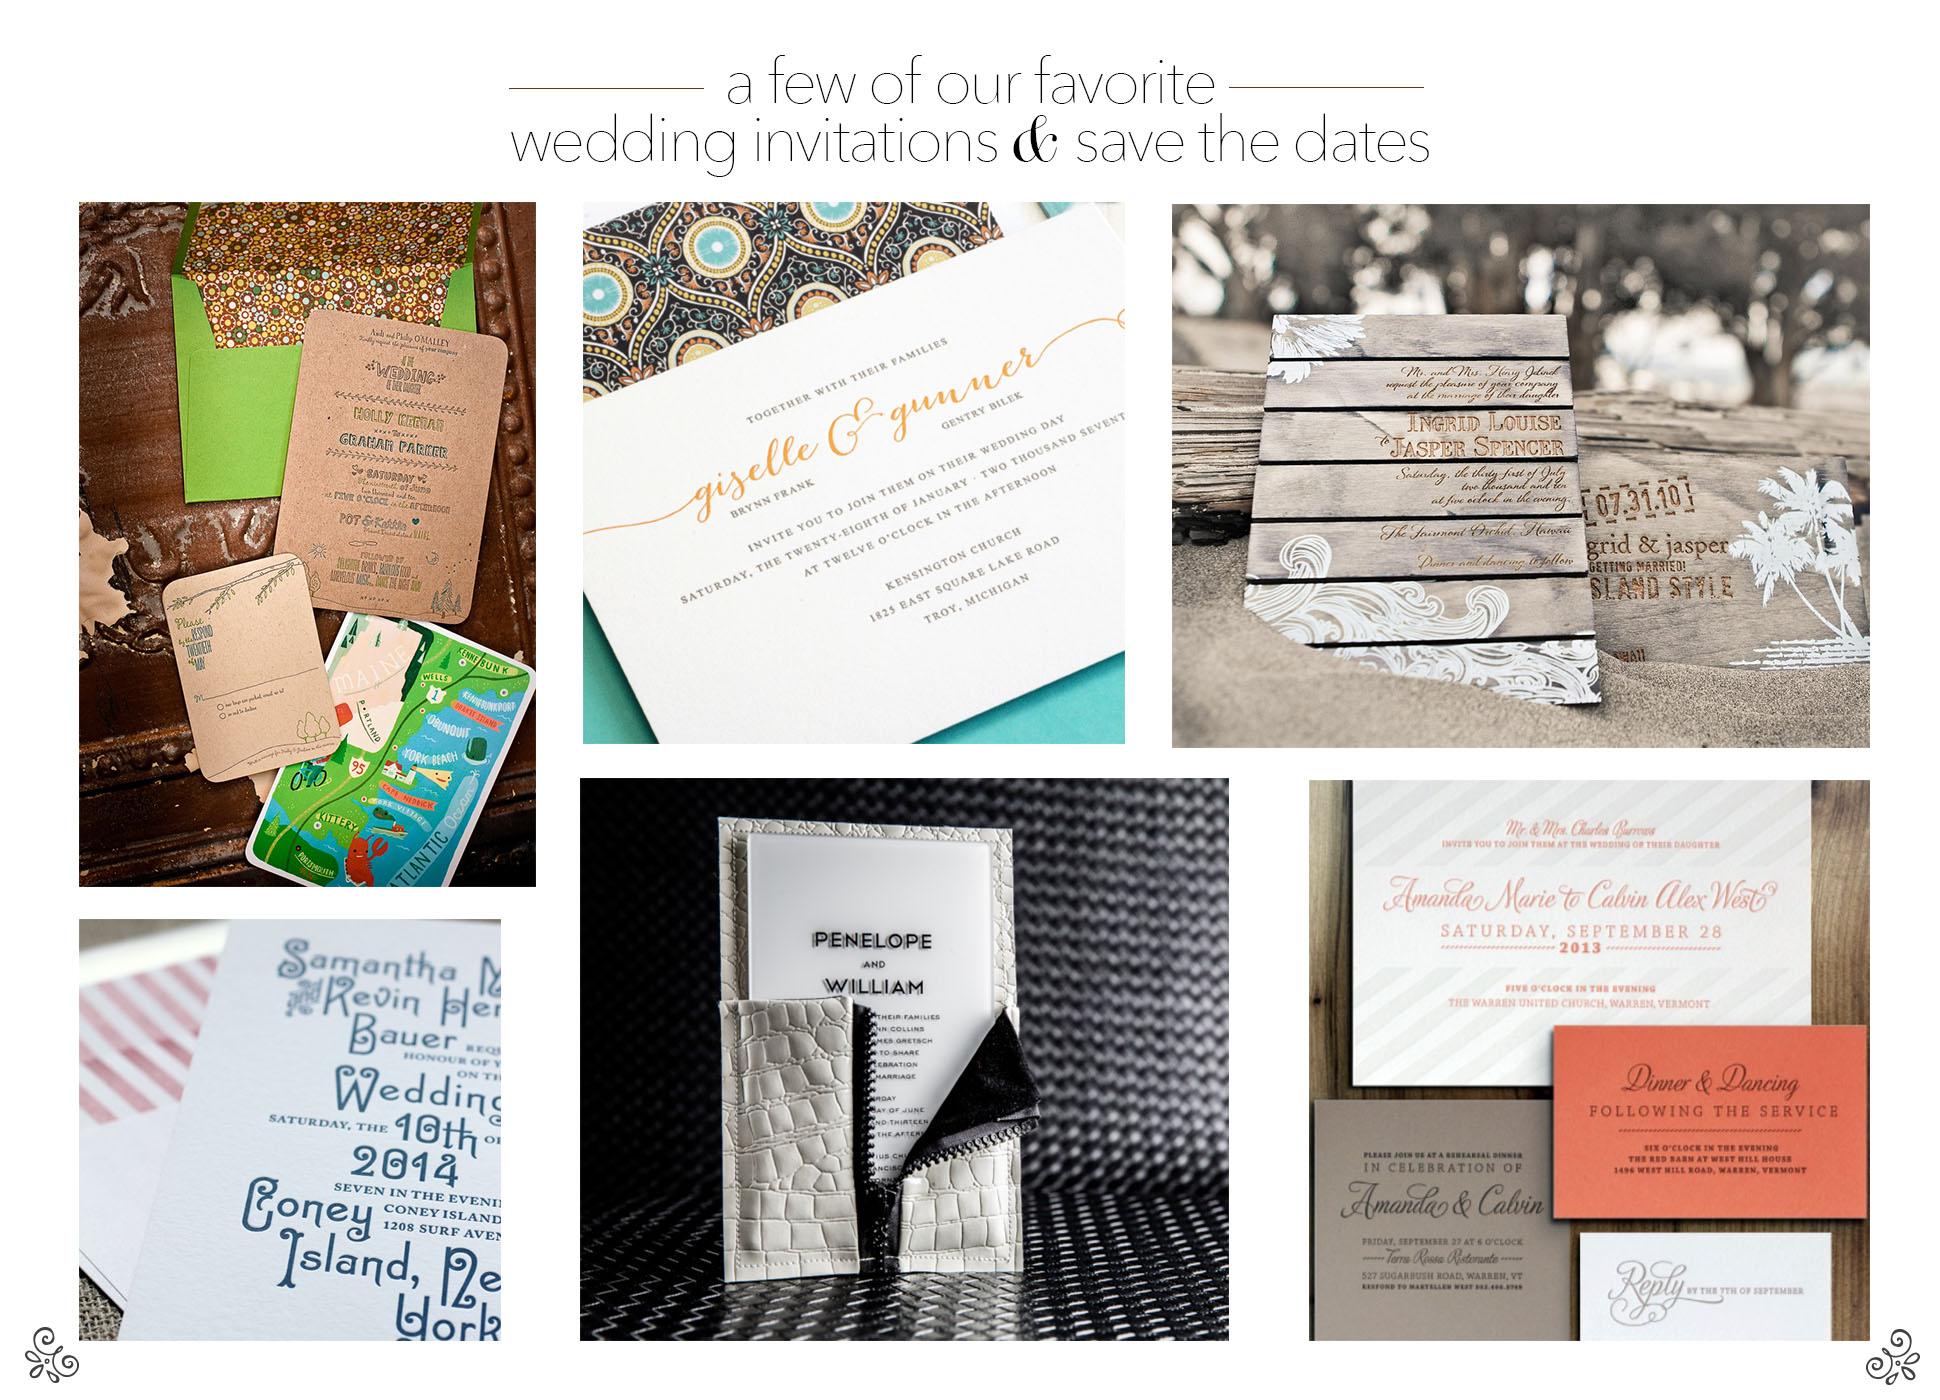 rsvp-wedding-category-page-copy.jpg